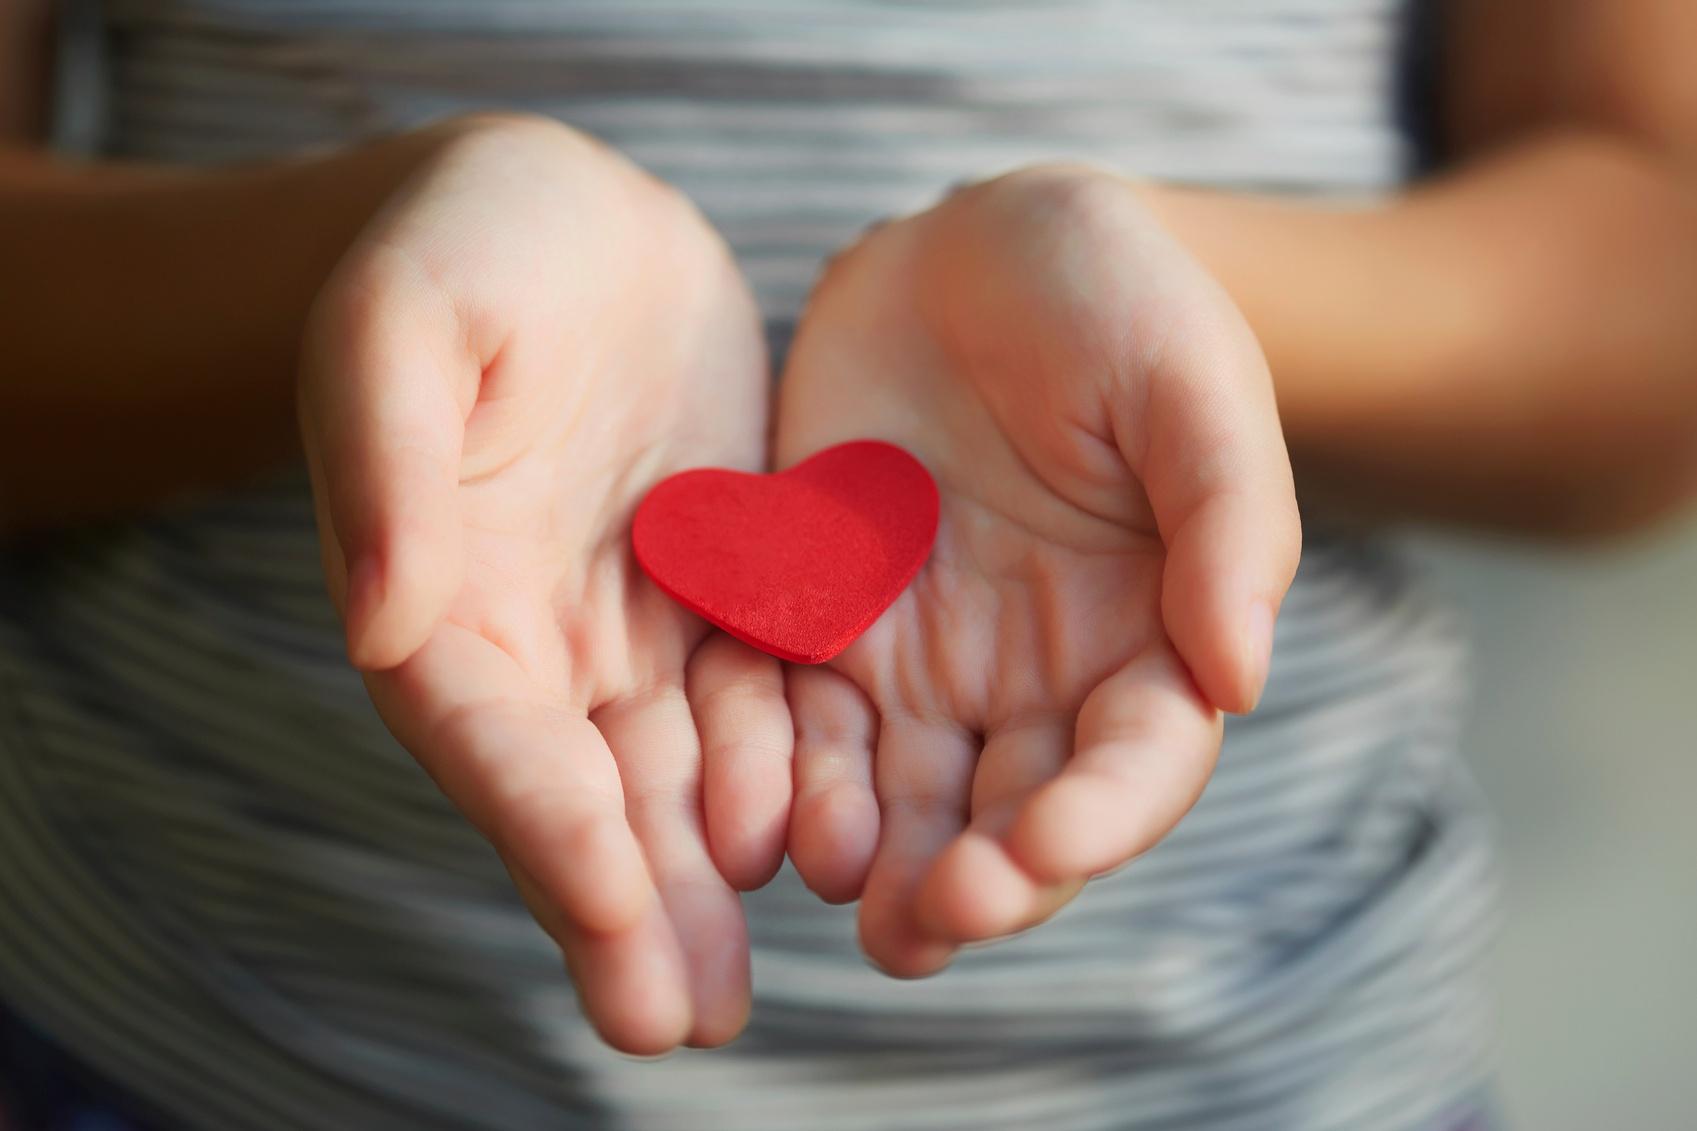 Little-girl-holding-a-red-heart-000075281195_Medium.jpg